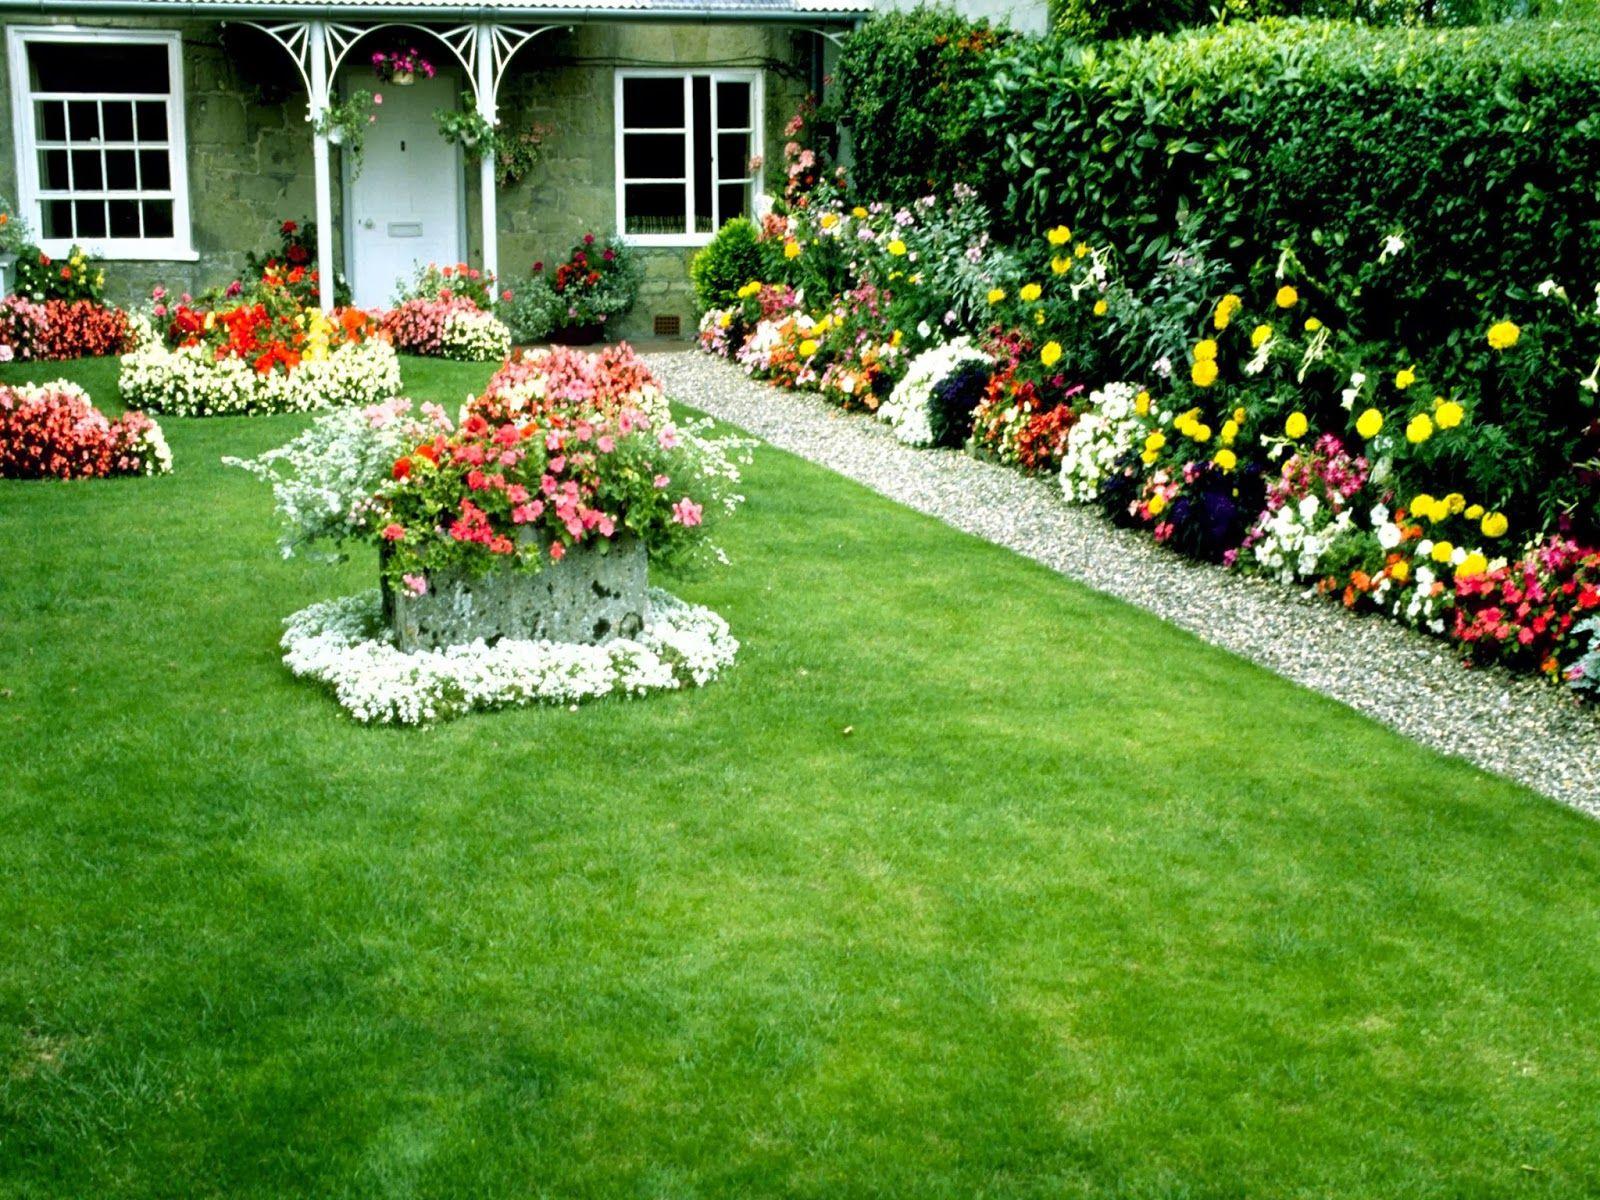 Country gardens wallpaper - Beautiful Beauty Country Desktop Backgrounds Flower Flowers Gallery Garden